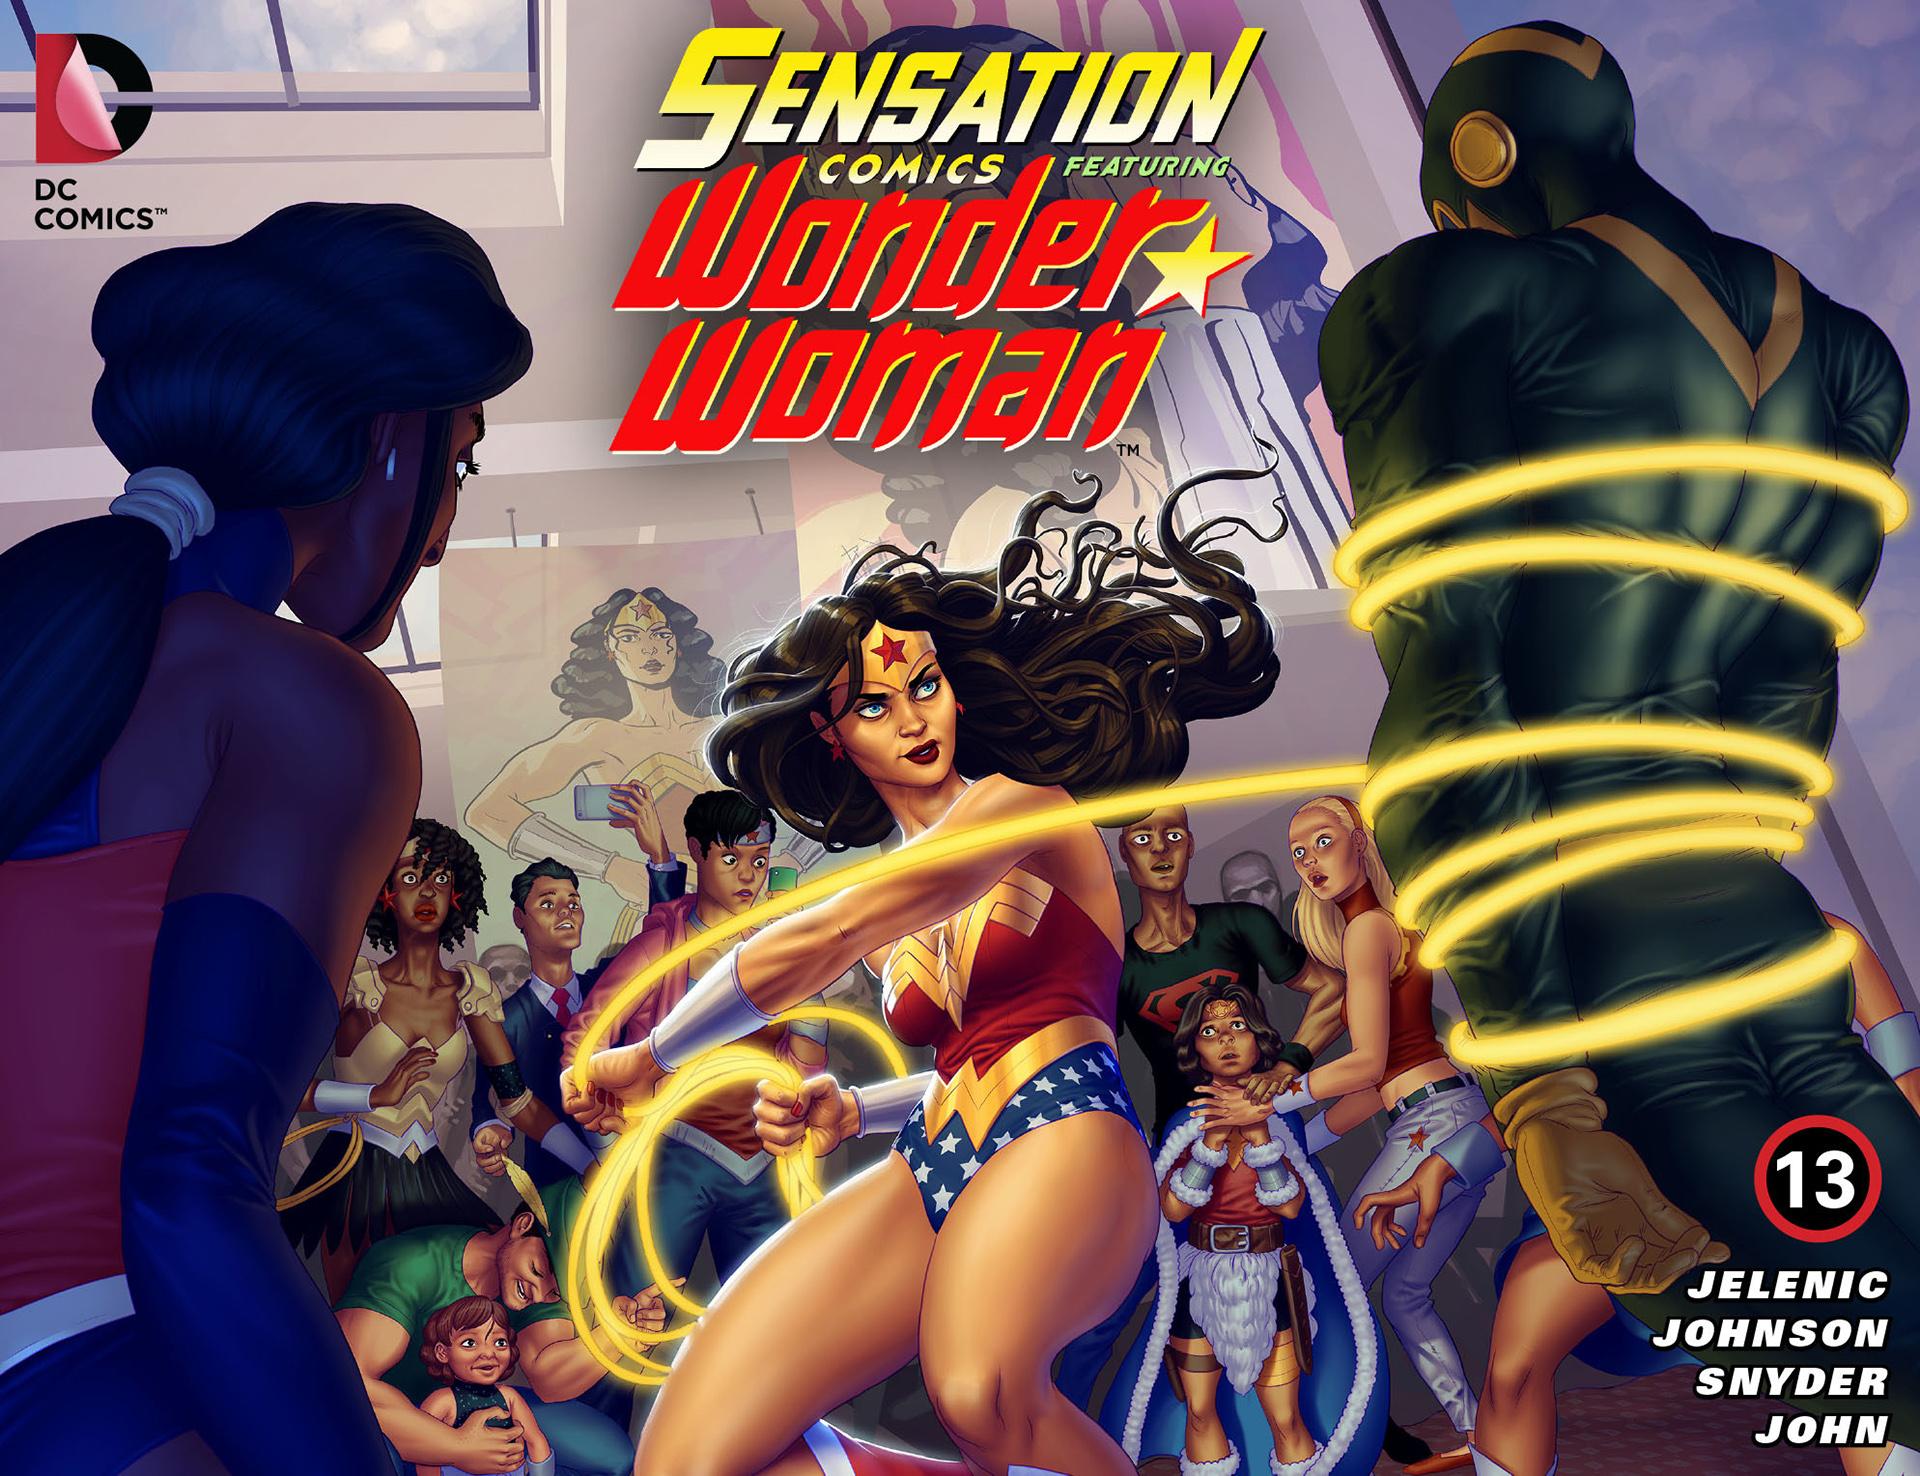 Read online Sensation Comics Featuring Wonder Woman comic -  Issue #13 - 1